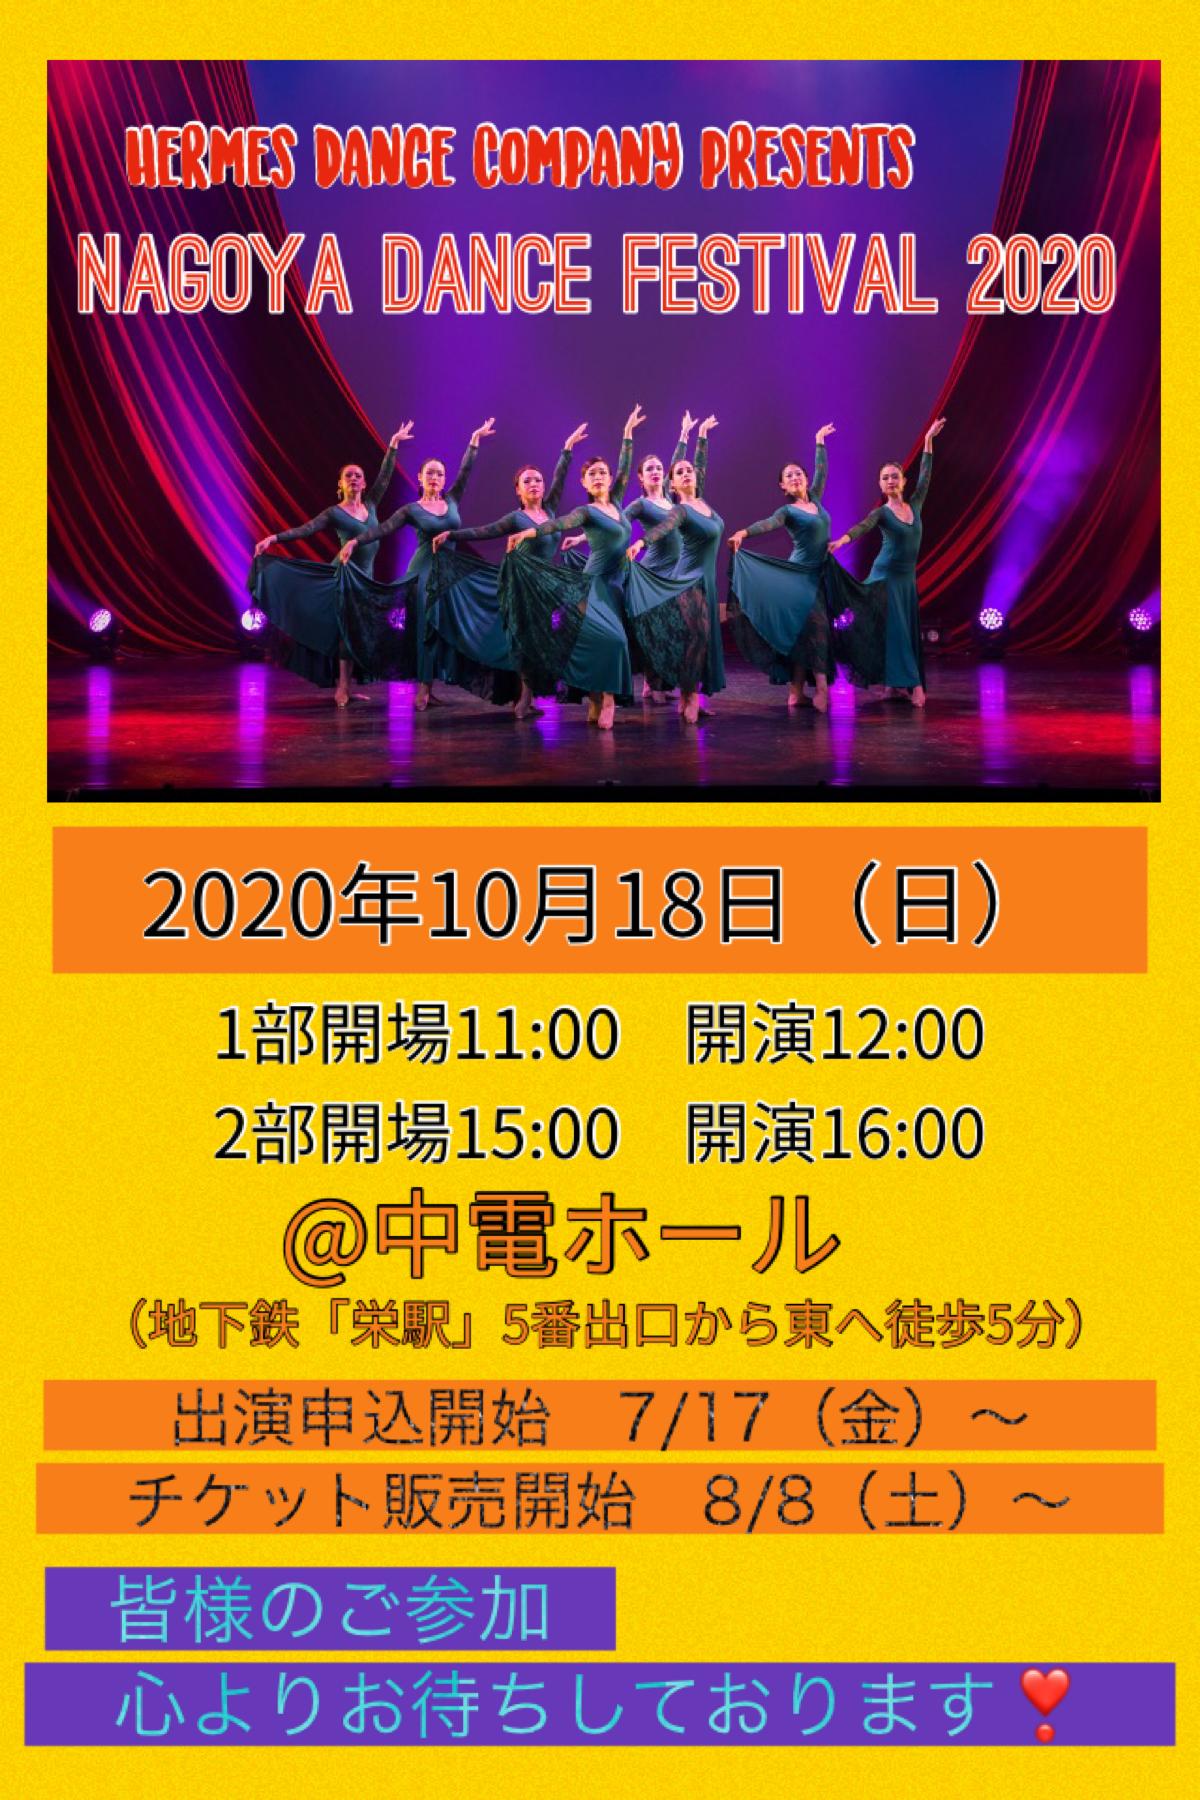 ★Nagoya Dance Festival2020タイムテーブル発表★